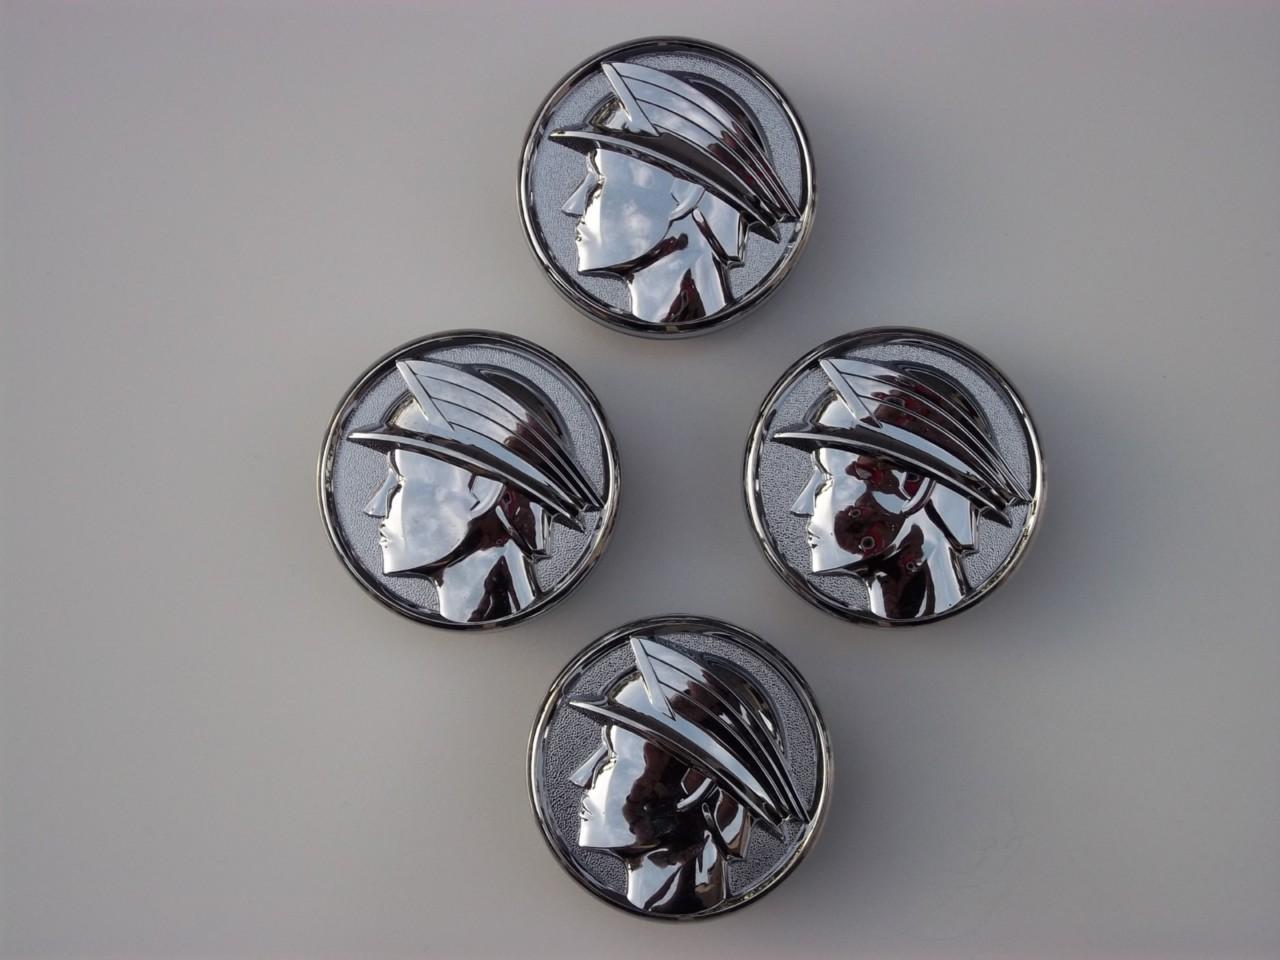 2003 2004 Mercury Marauder Center Caps 4 Piece Set Ebay